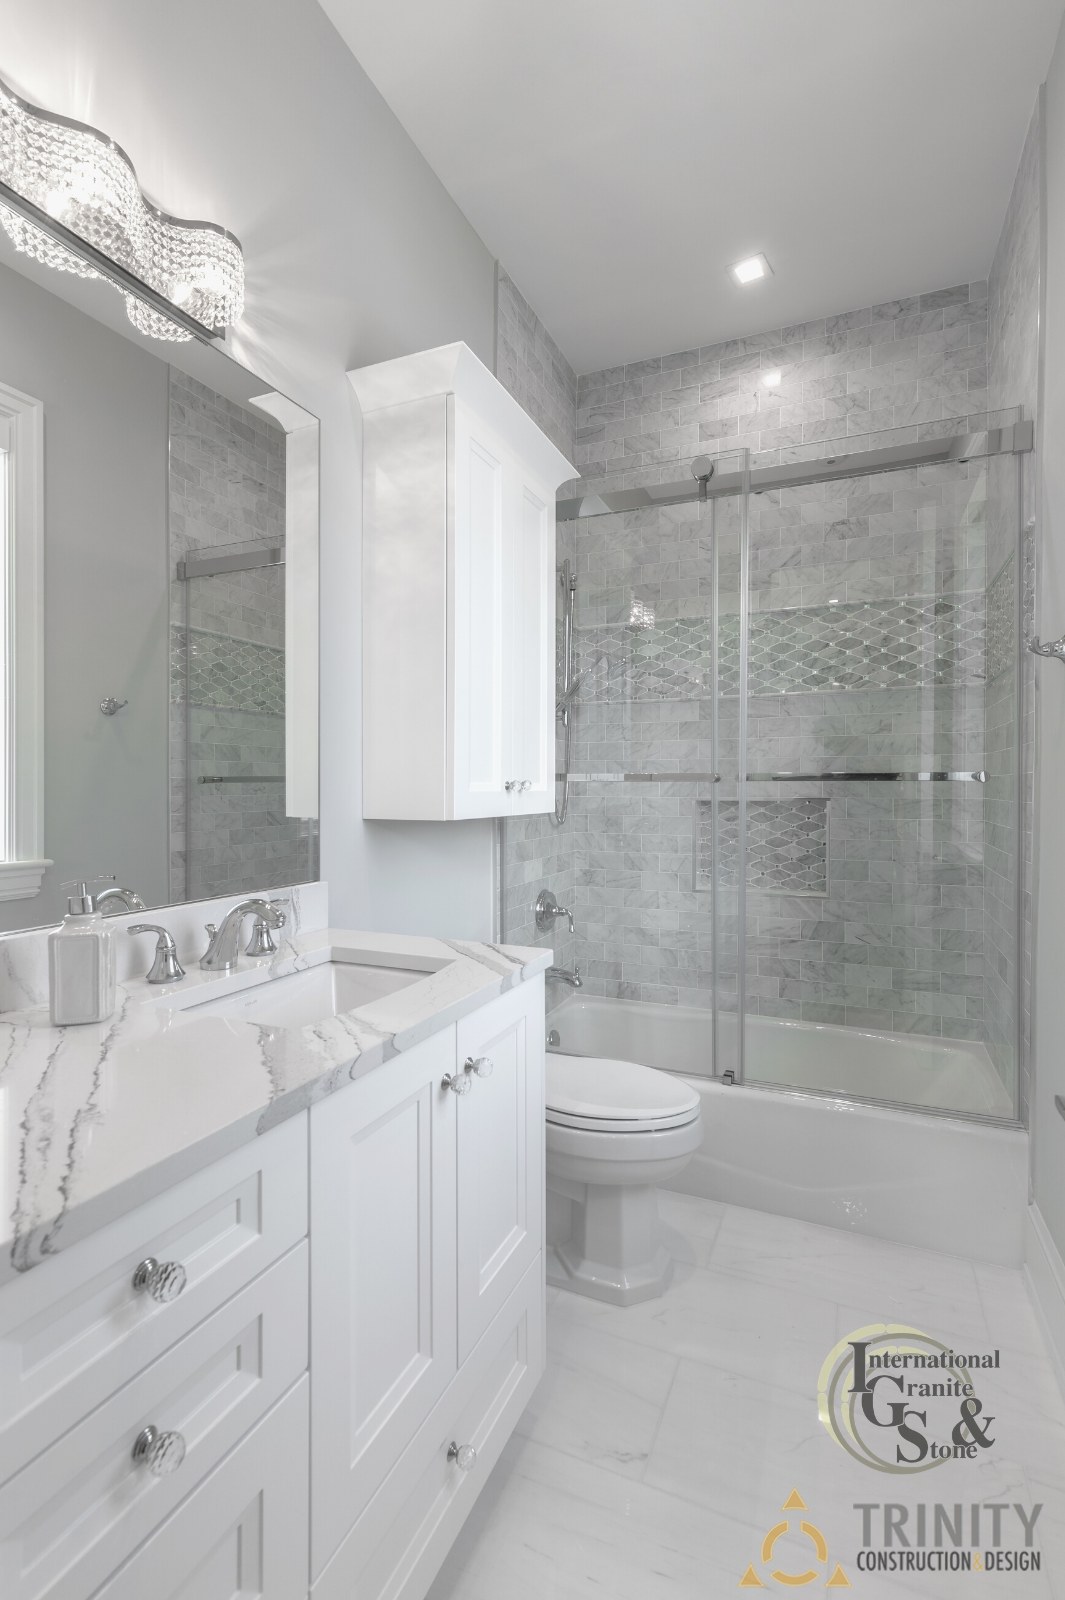 Light White Bathroom with Brittanicca Quartz Countertops and Gray Tile Backsplash Walls in Shower